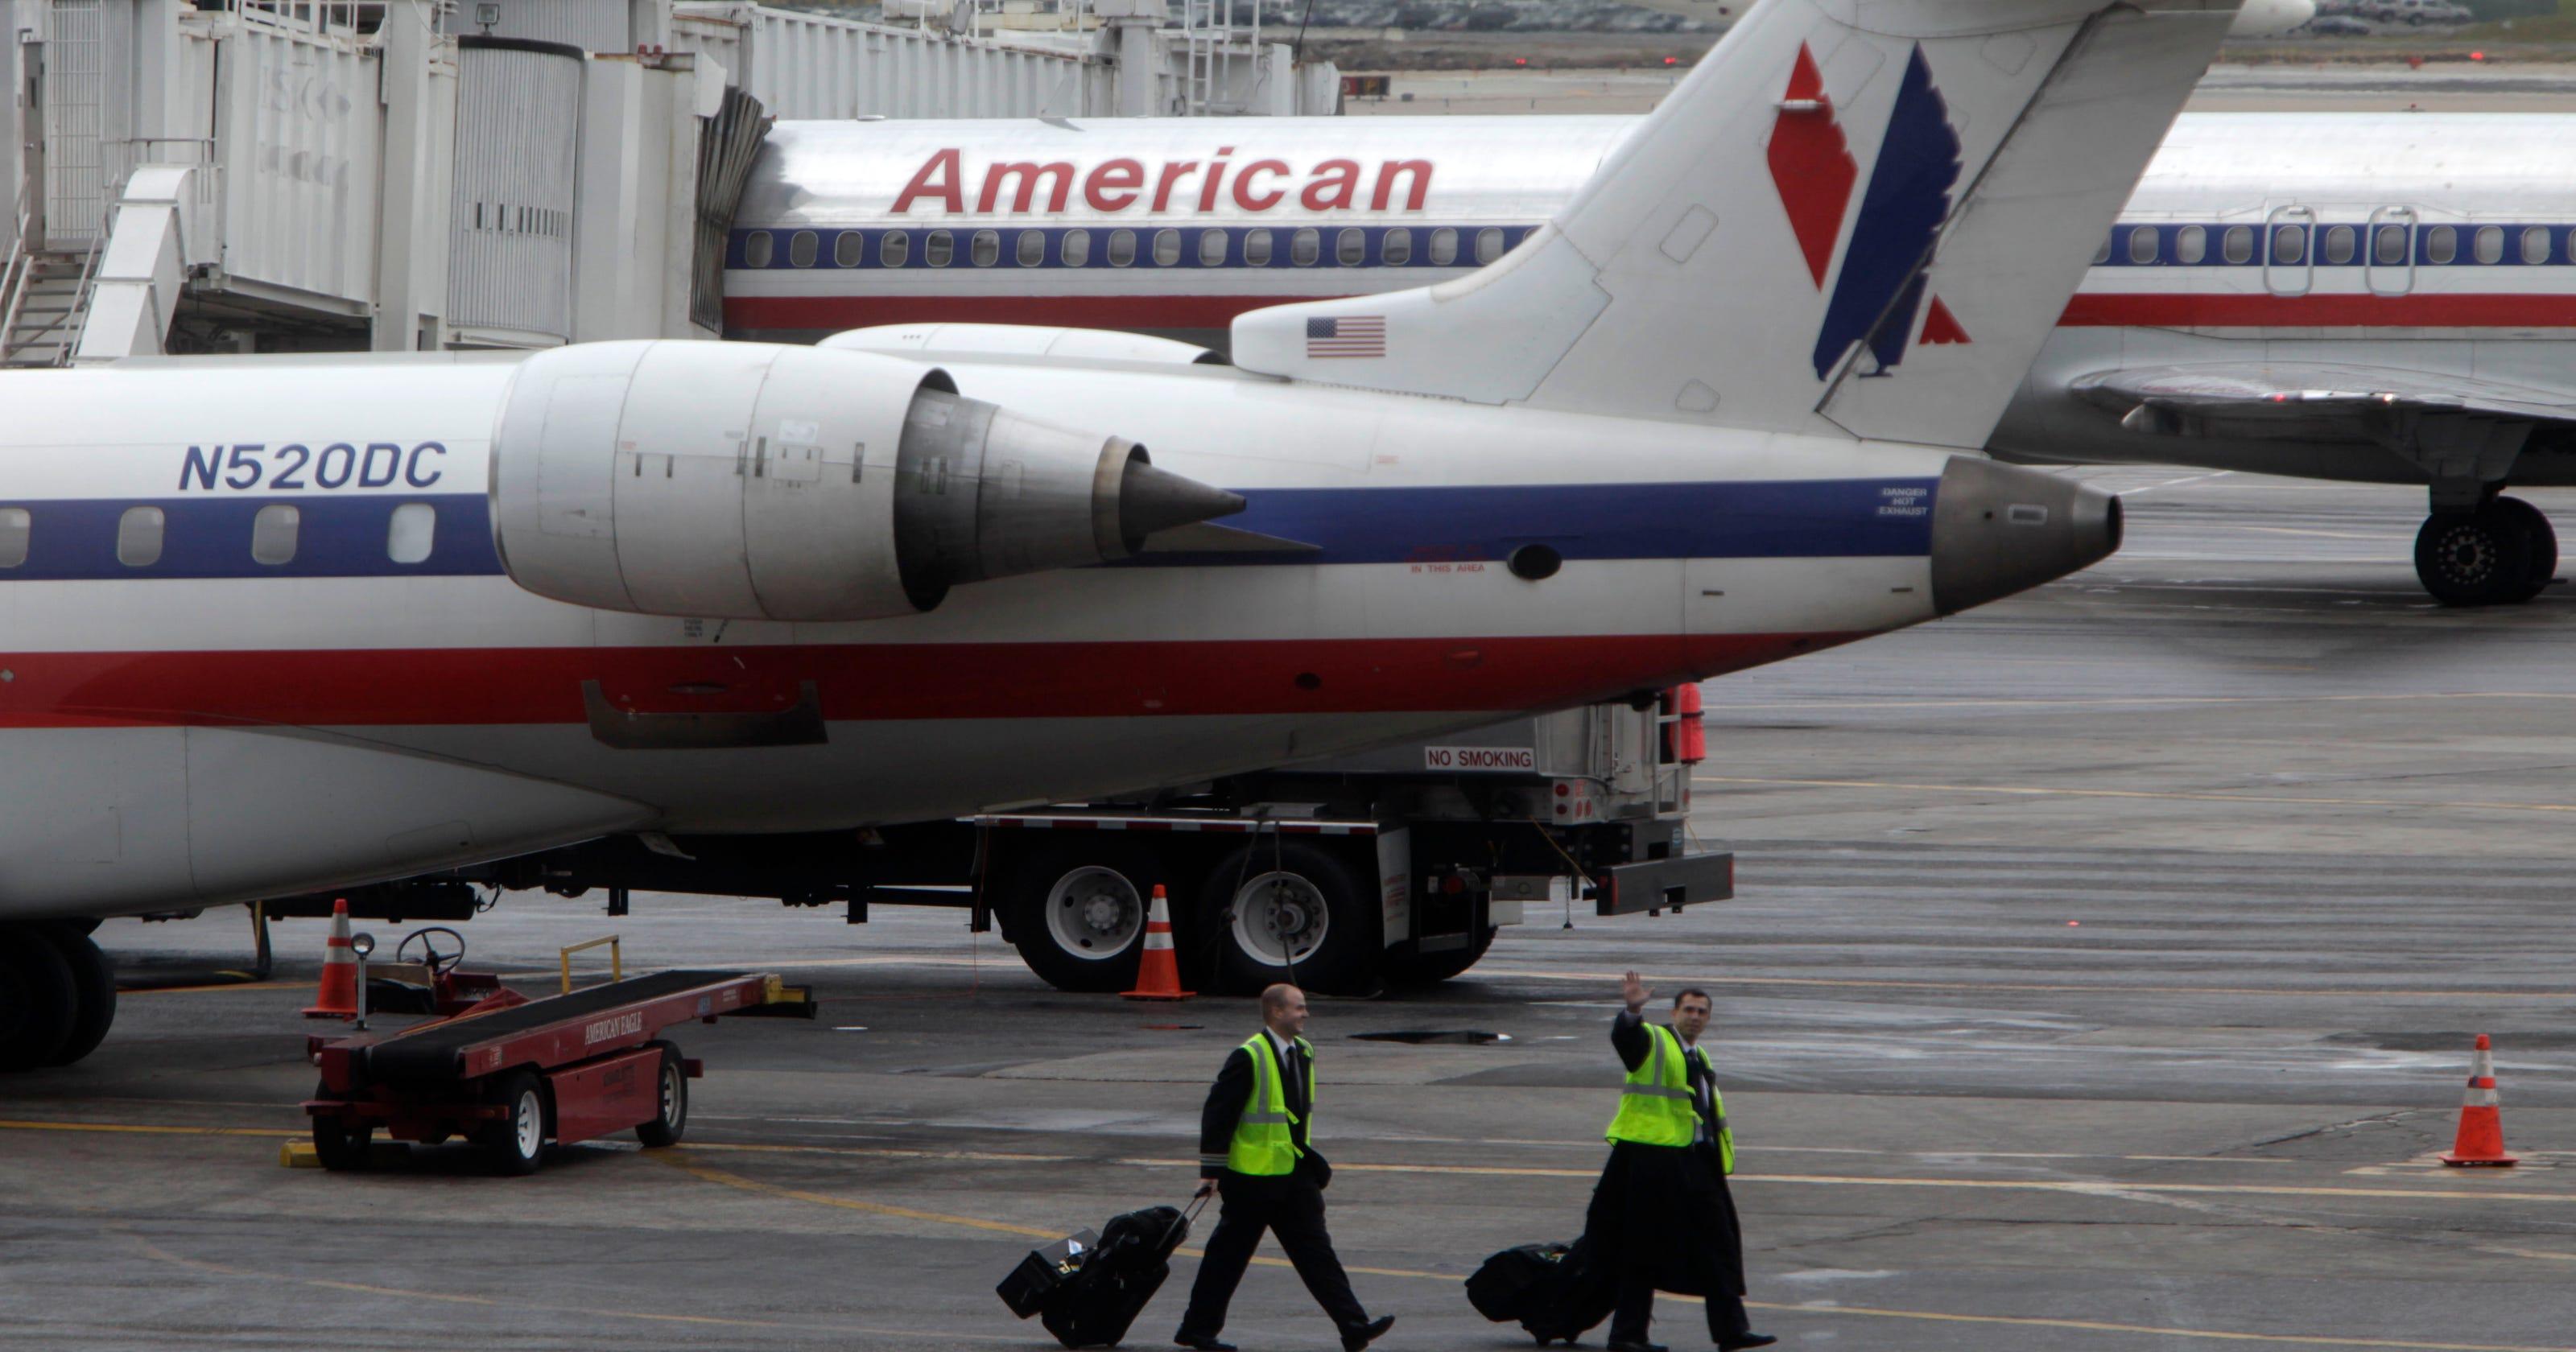 Fetus Found In American Airlines Plane At Laguardia Airport